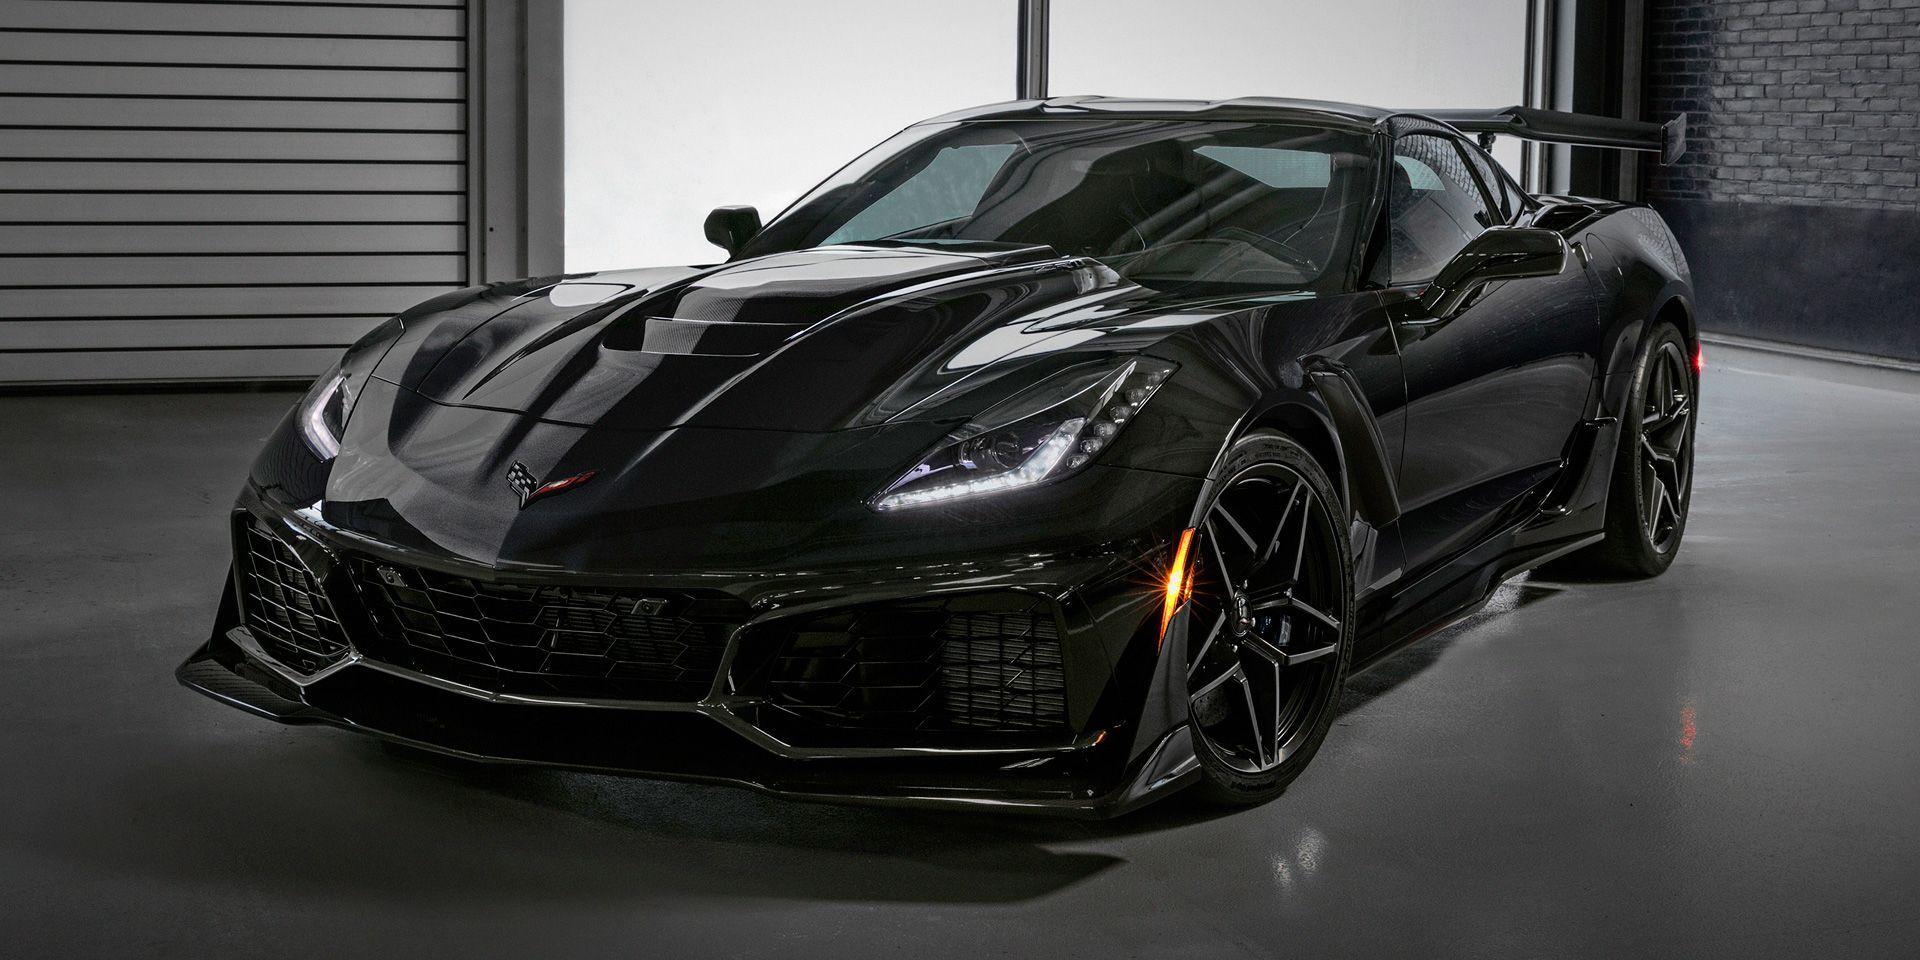 2019 Chevrolet Corvette Corvette zr1, Chevrolet corvette